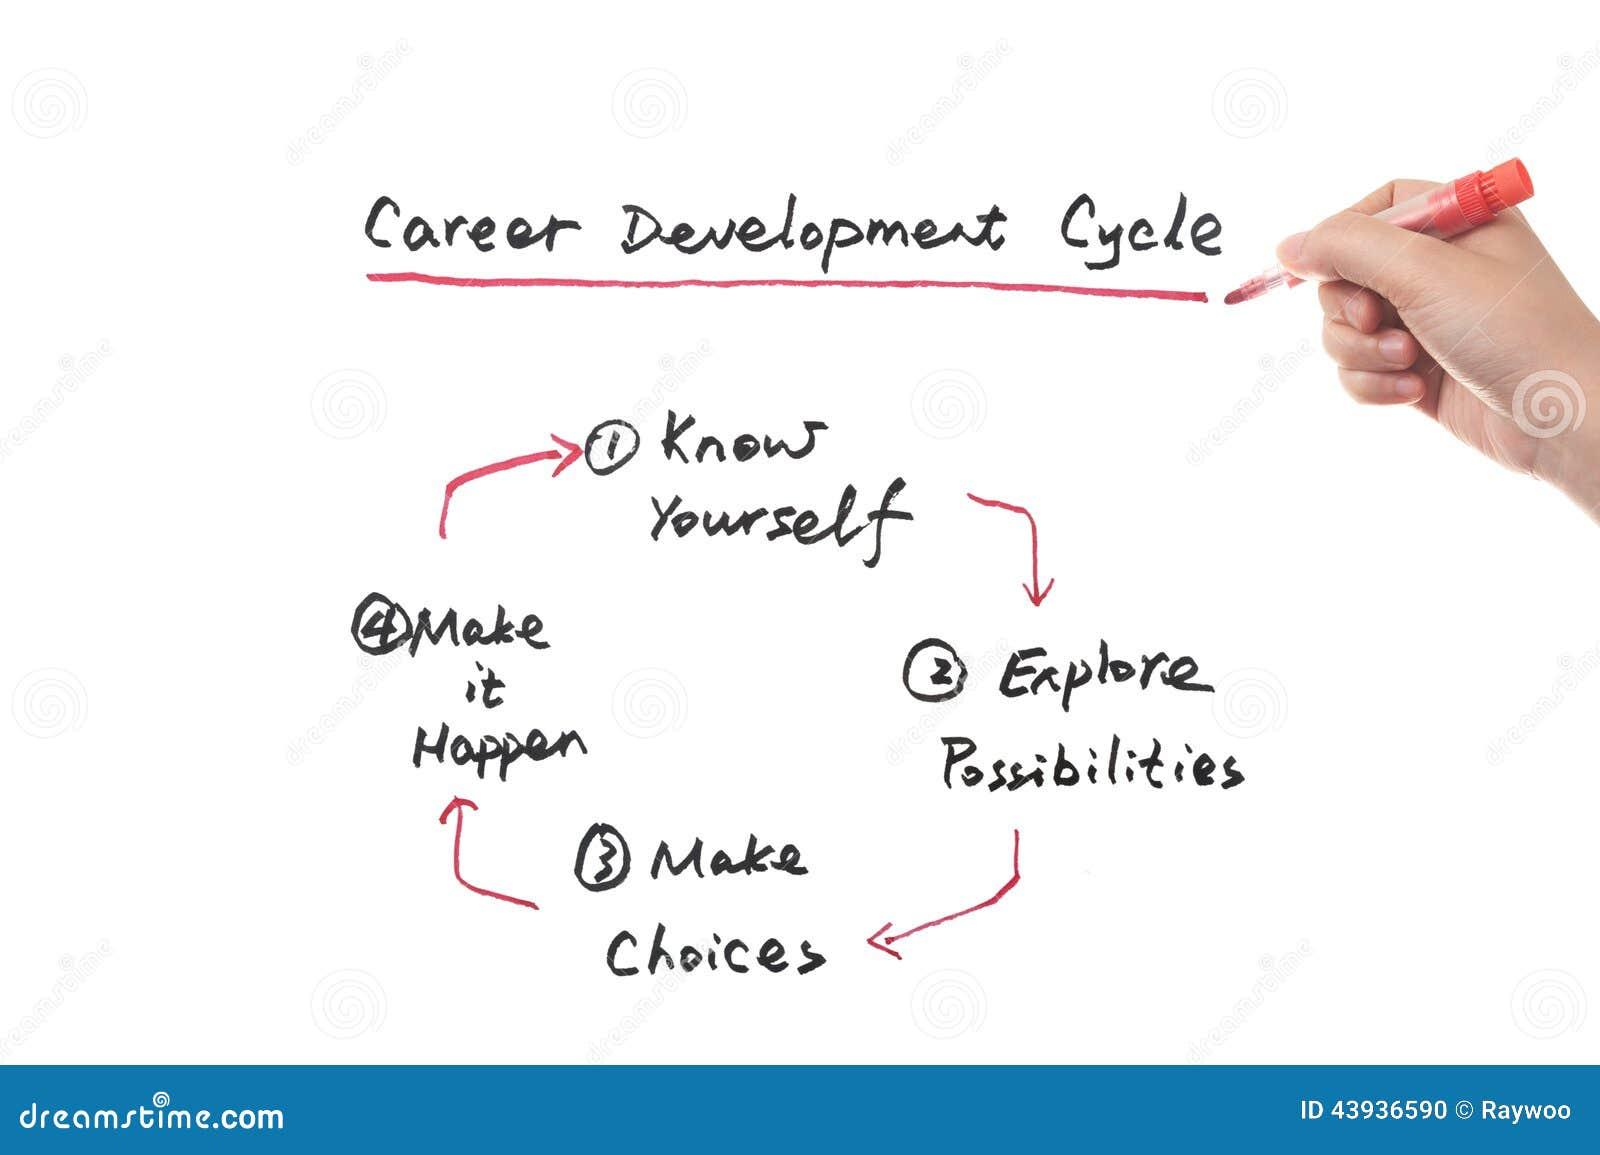 Career Development Cycle Concept Stock Photo